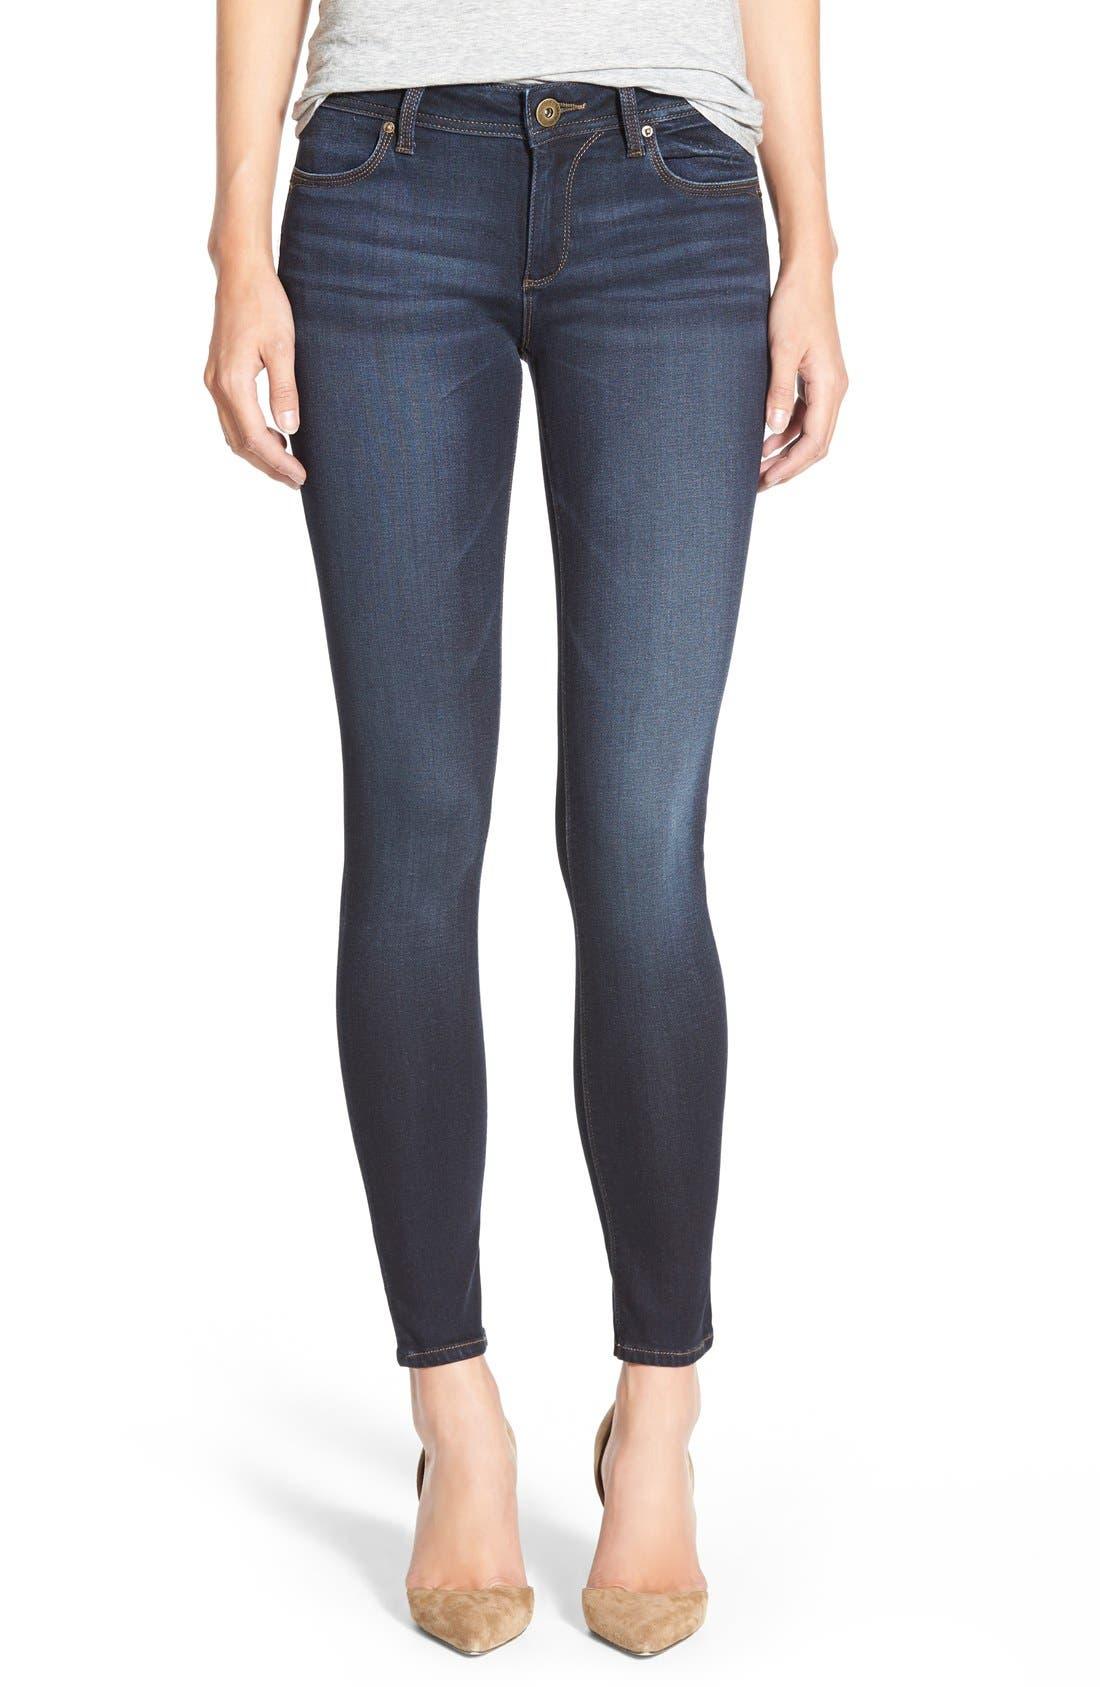 Alternate Image 1 Selected - DL1961 'Emma' Power Legging Jeans (Walton)